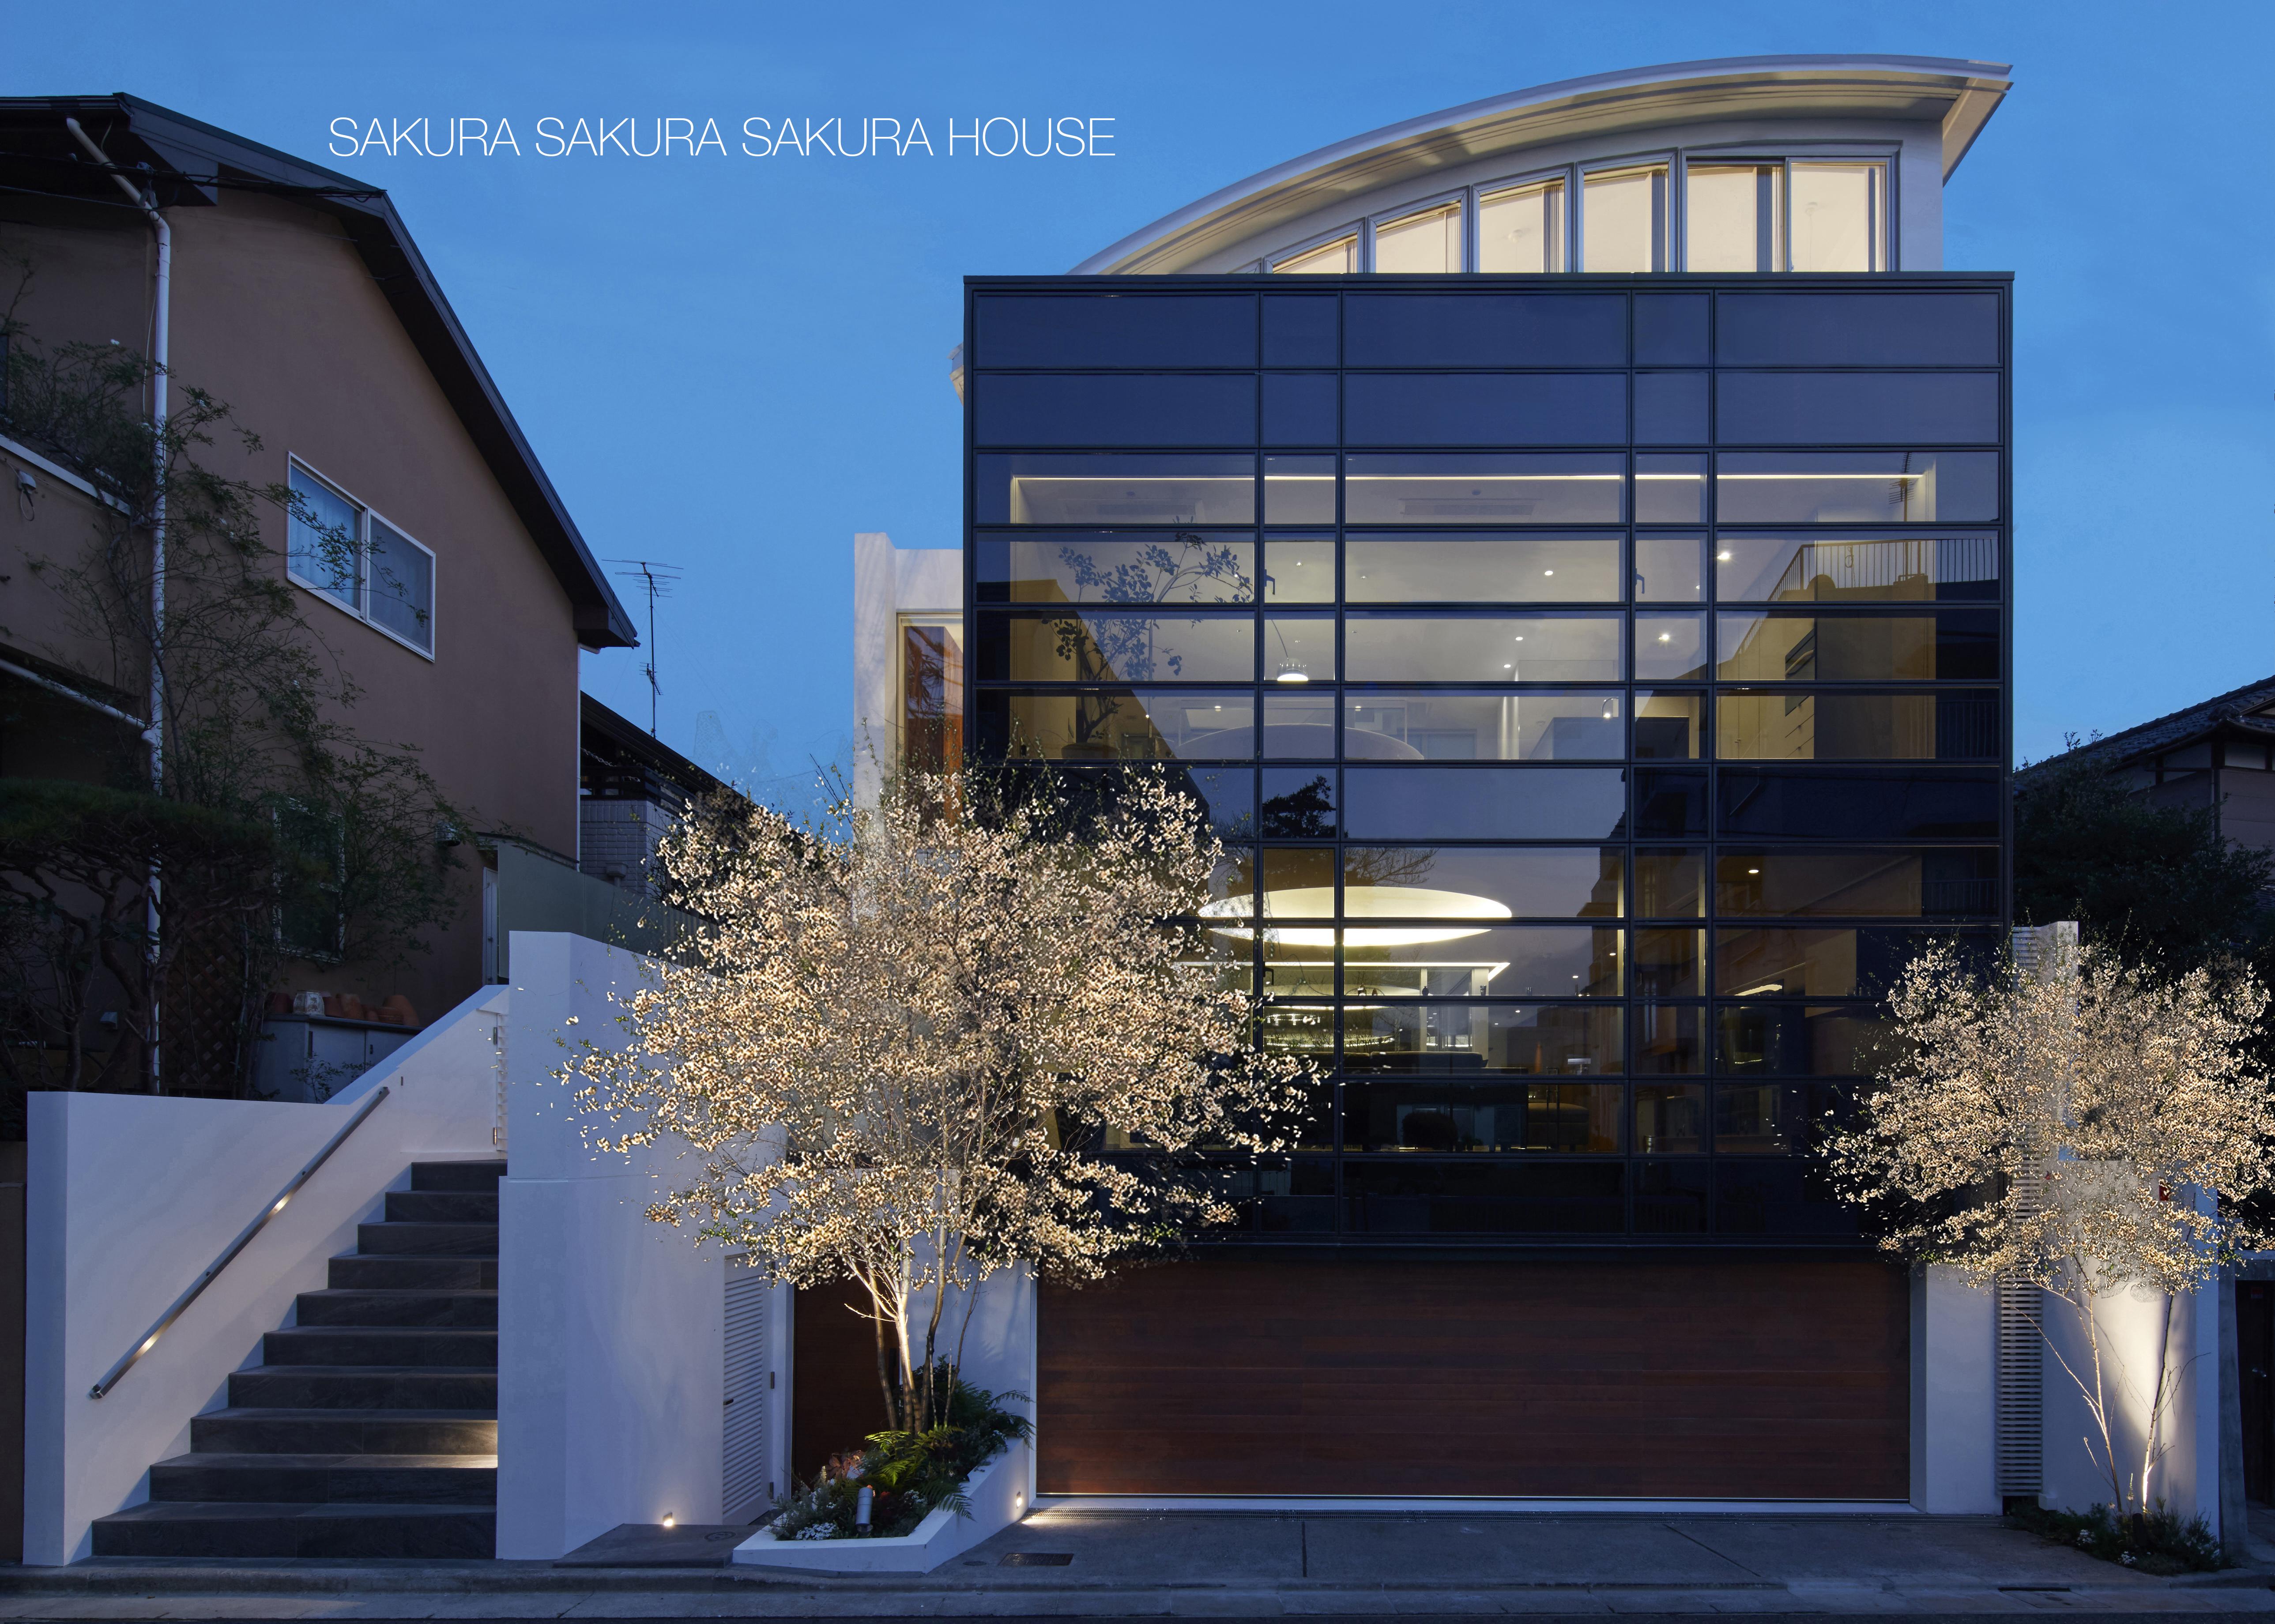 SAKURA SAKURA SAKURA HOUSE | 3世帯高級邸宅